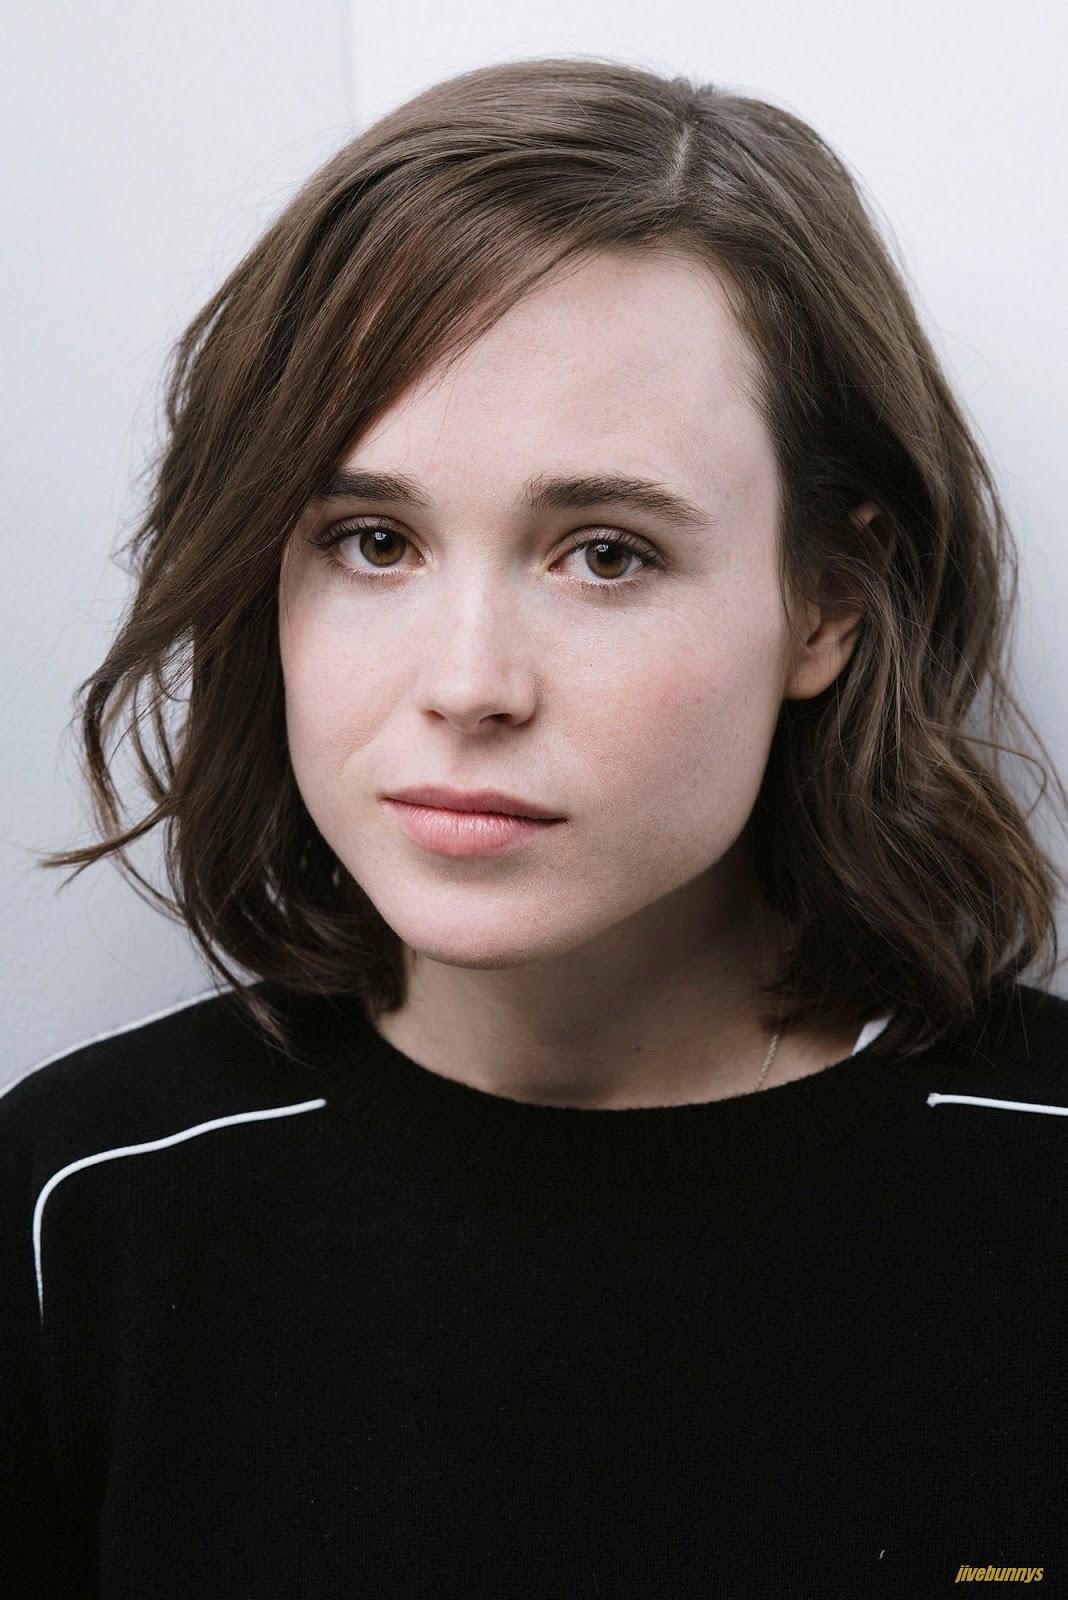 Jivebunnys Female Celebrity Picture Gallery: Ellen Page ... Ellen Page